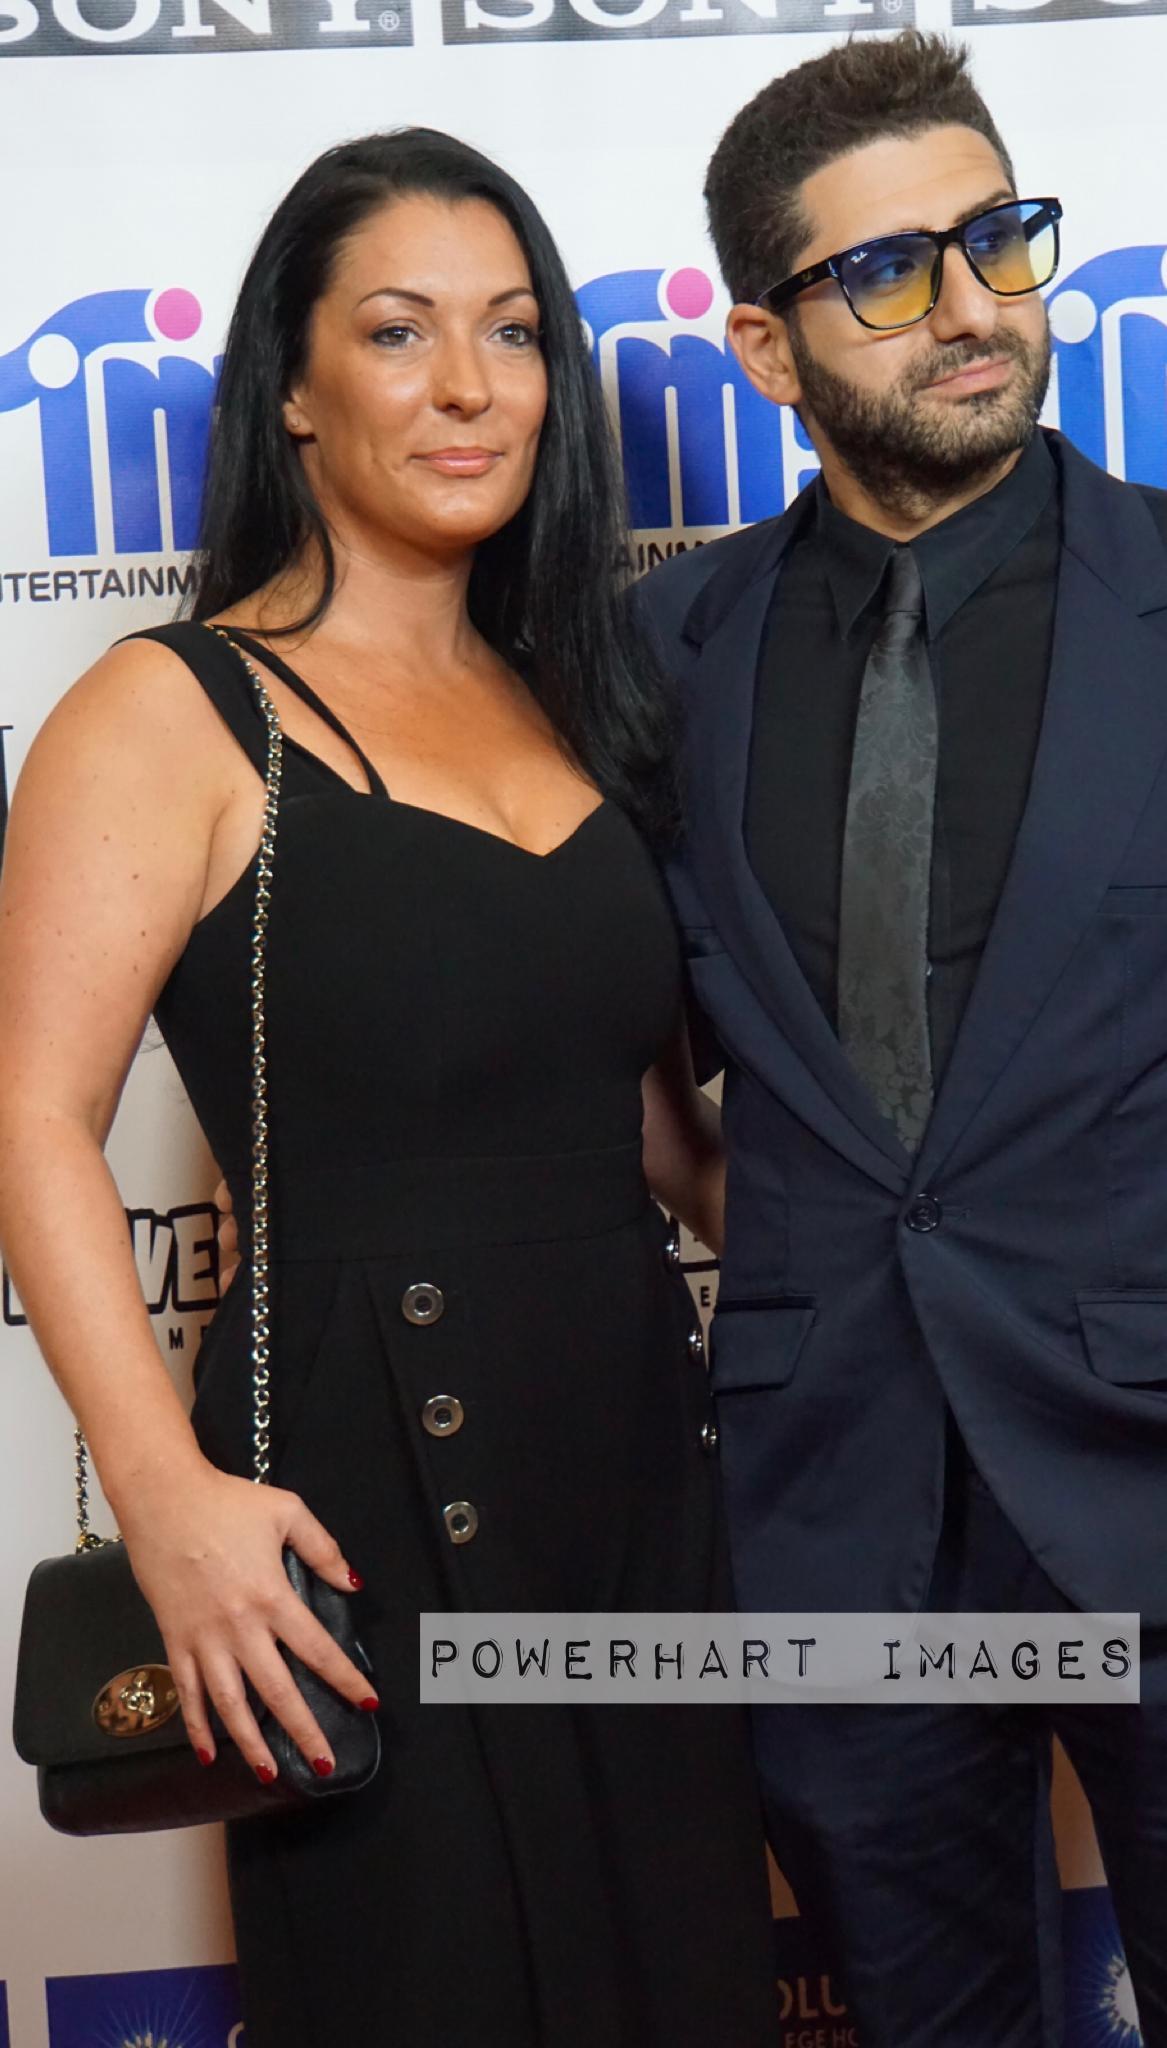 Aiman Harhish and Jo Morris at an event for Dagenham (2018)